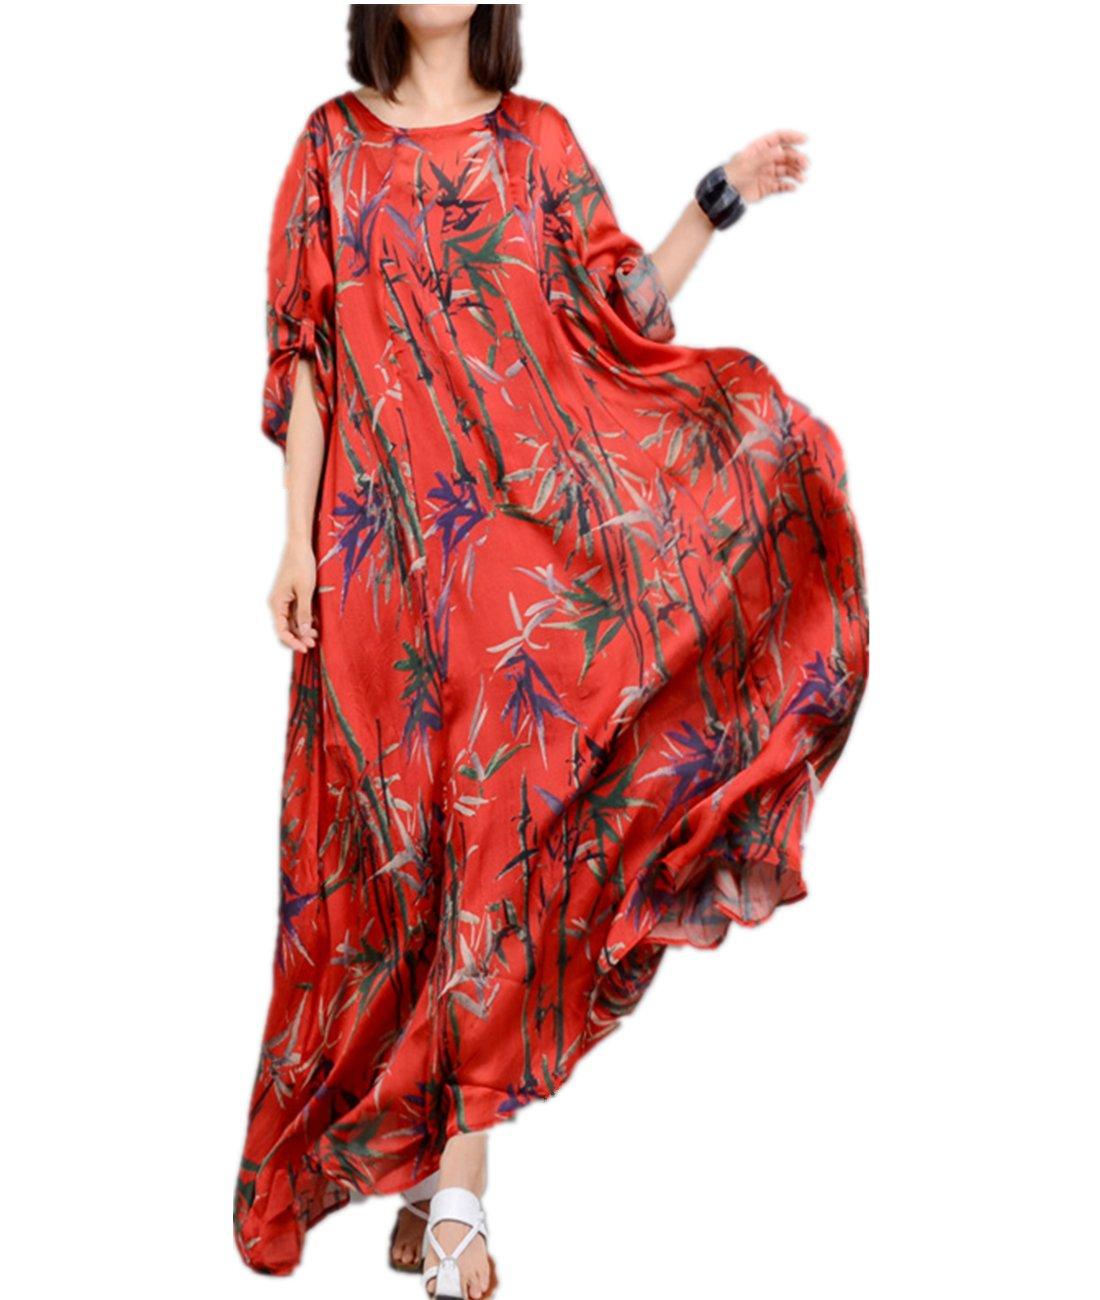 YESNO JO1 Women Long Loose Maxi Swing Dress 100% Silk Bohemia 'Bamboo' Printed Roll-up Sleeve